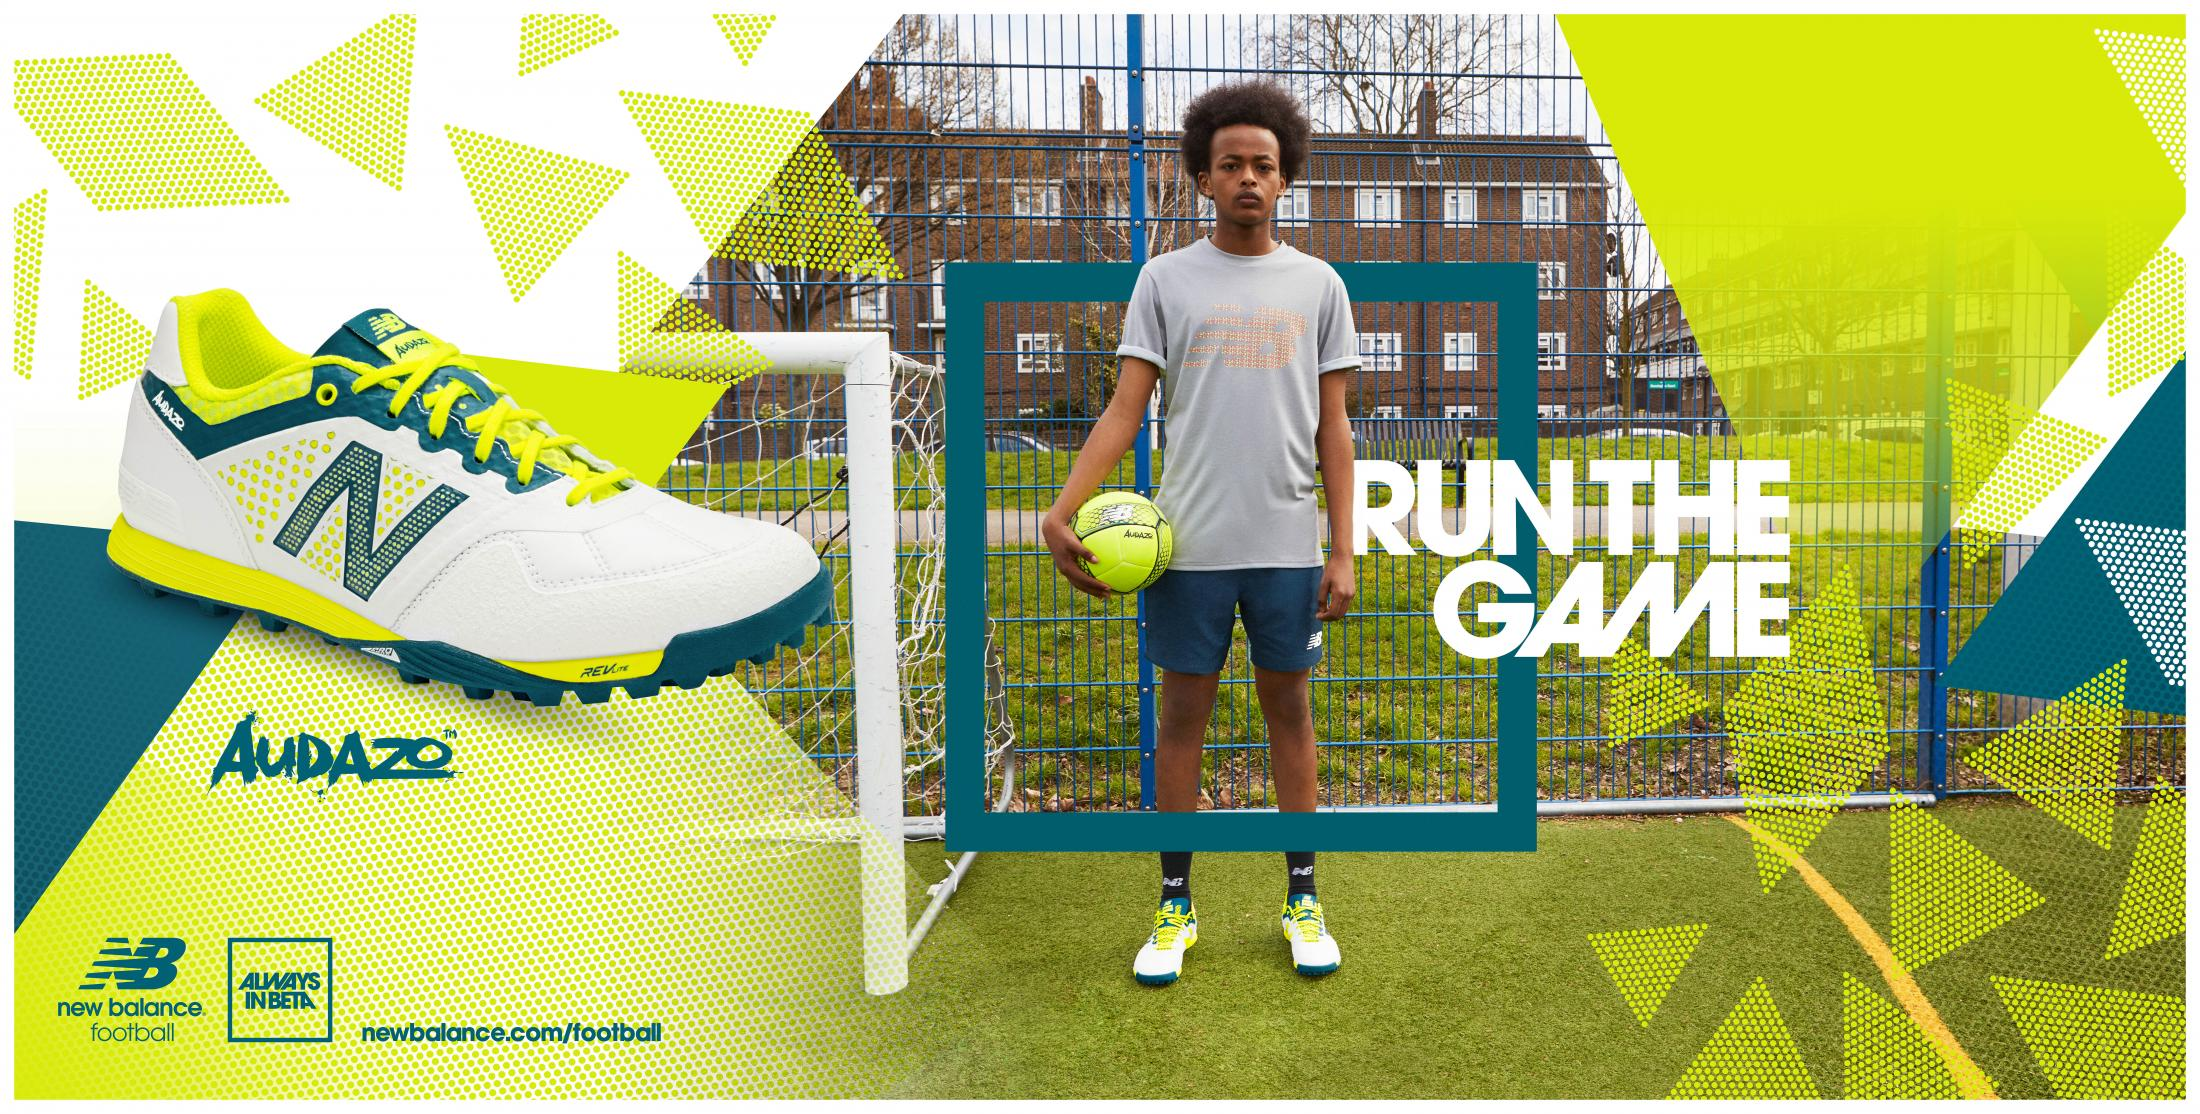 Thumbnail for New Balance Football - Audazo Launch